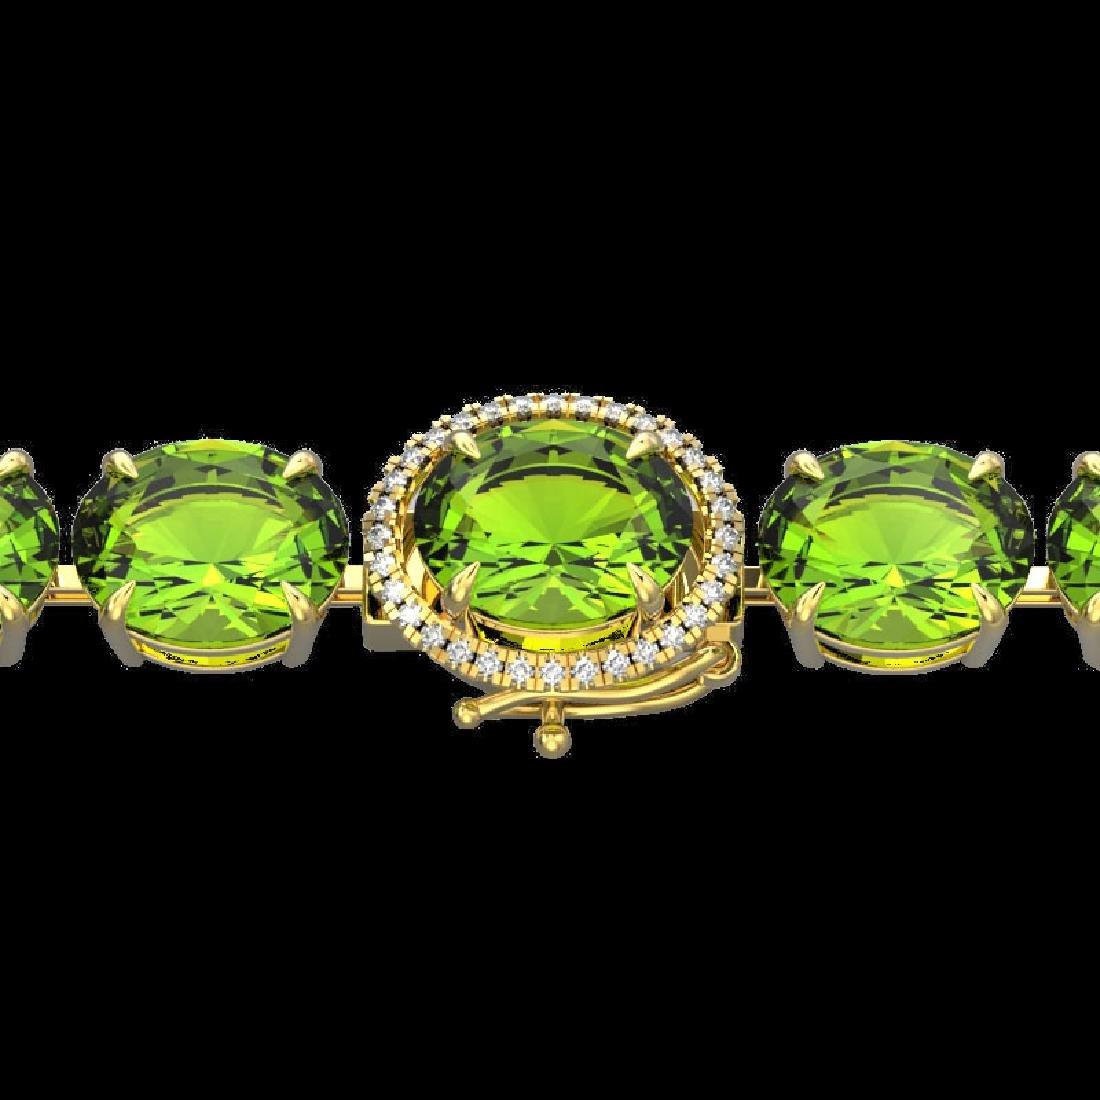 67 CTW Peridot & Micro Pave VS/SI Diamond Halo Bracelet